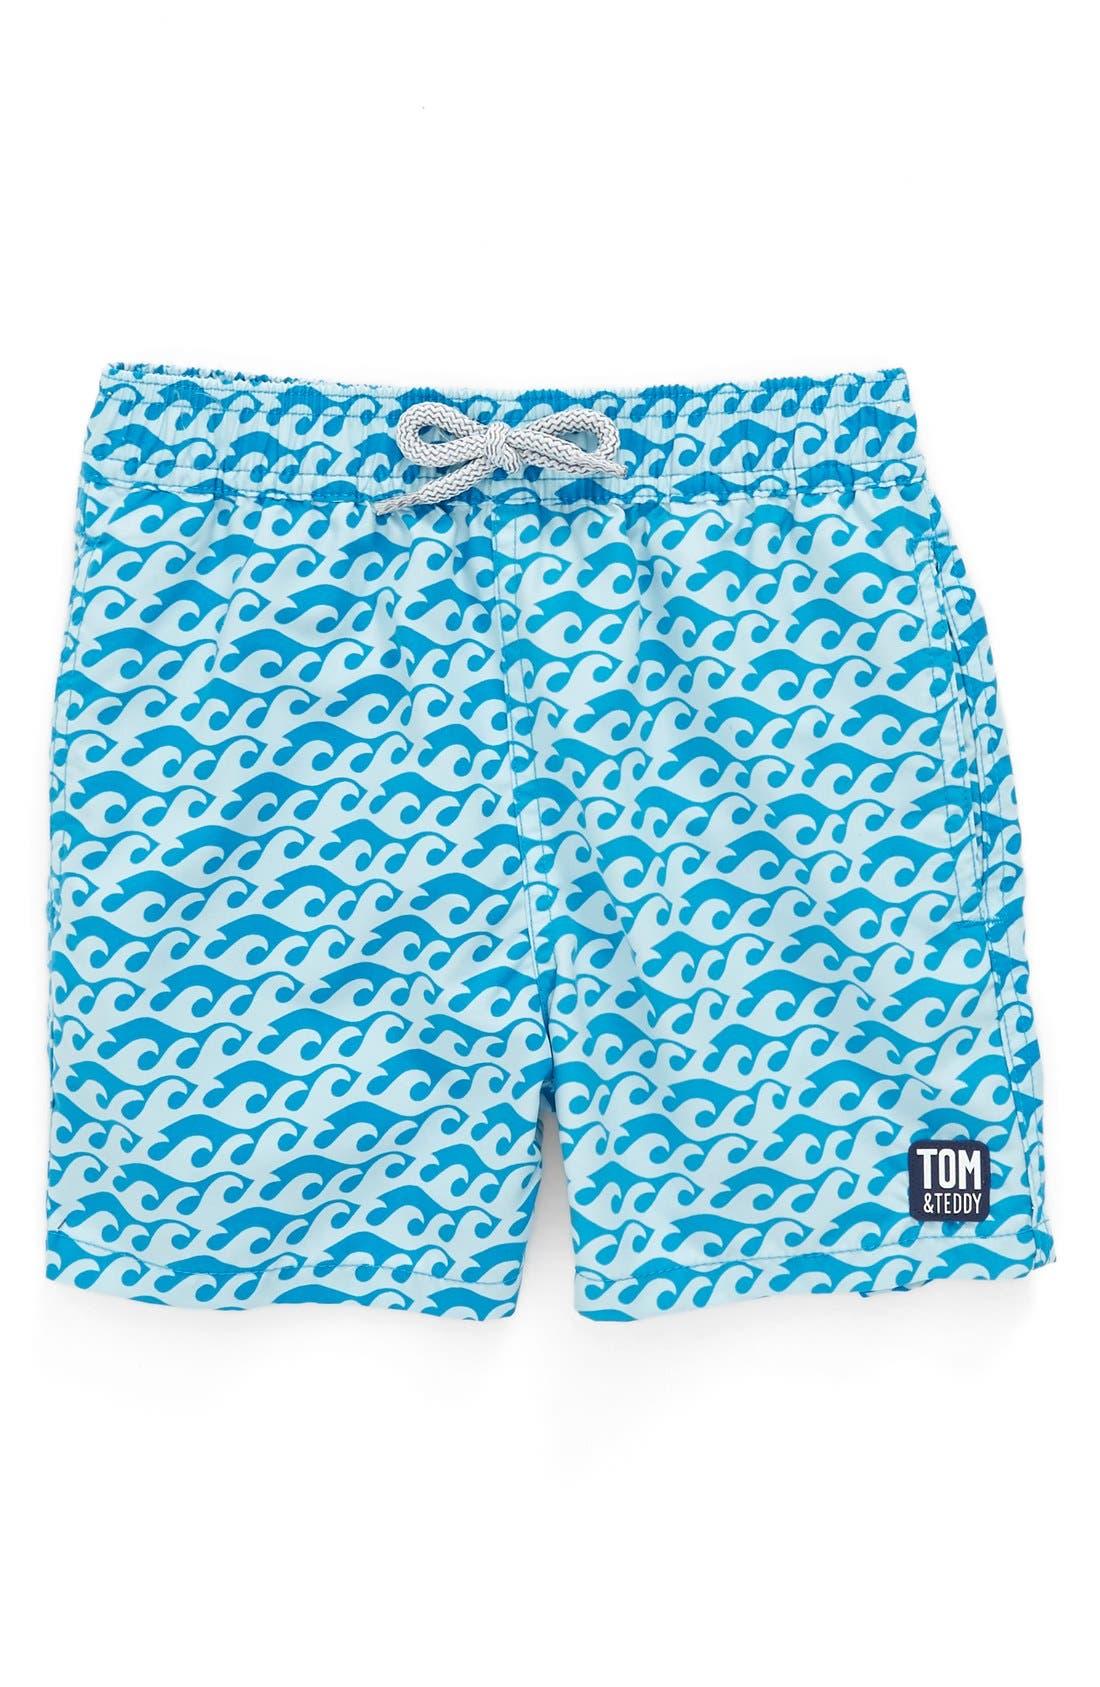 Tom & Teddy 'Pattern Waves' Swim Trunks (Toddler Boys, Little Boys & Big Boys)